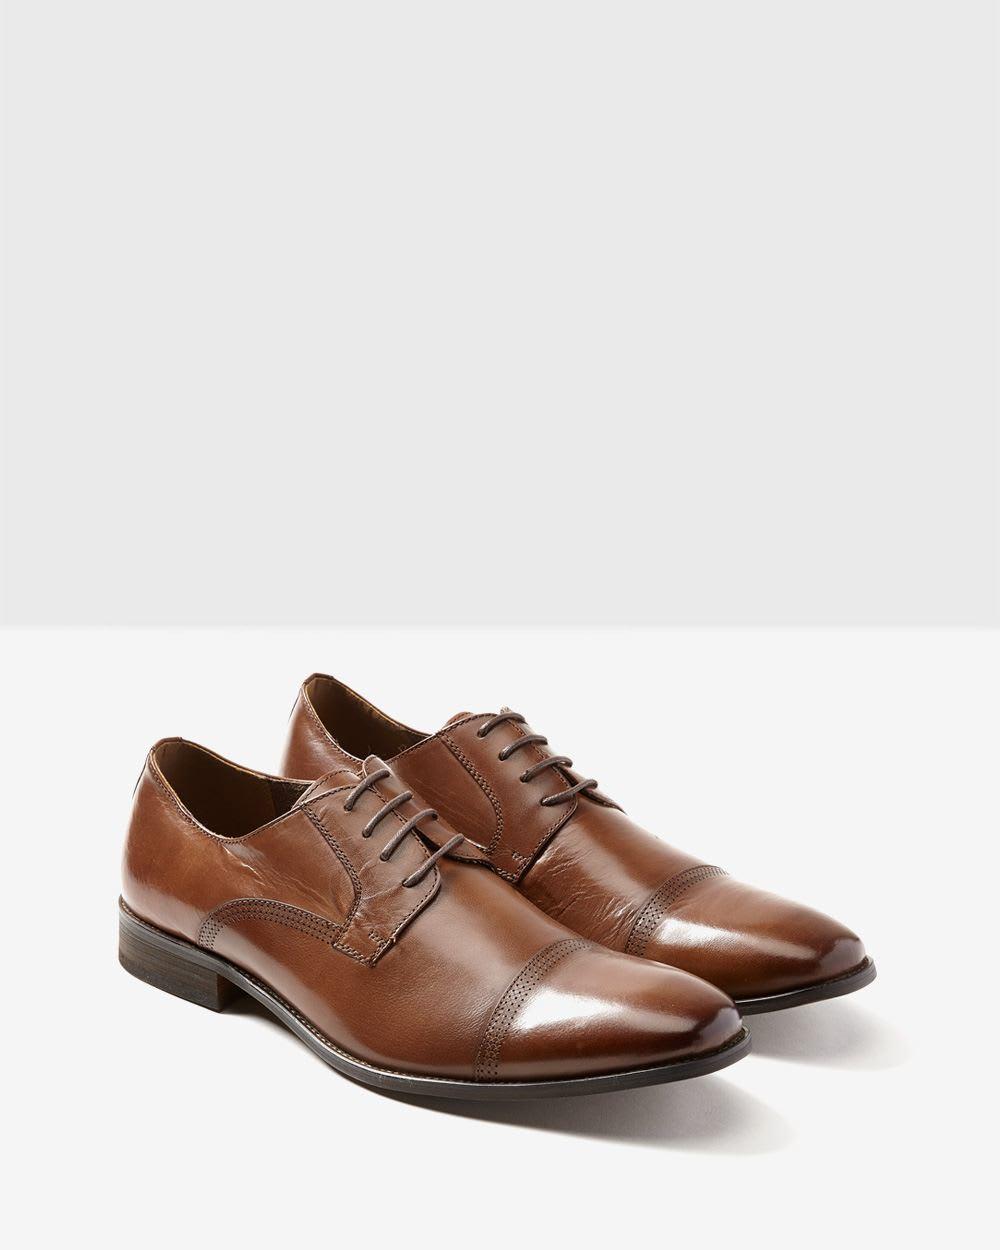 f00b4e8b99f9 Steve Madden (TM) - Catchimm dress shoe